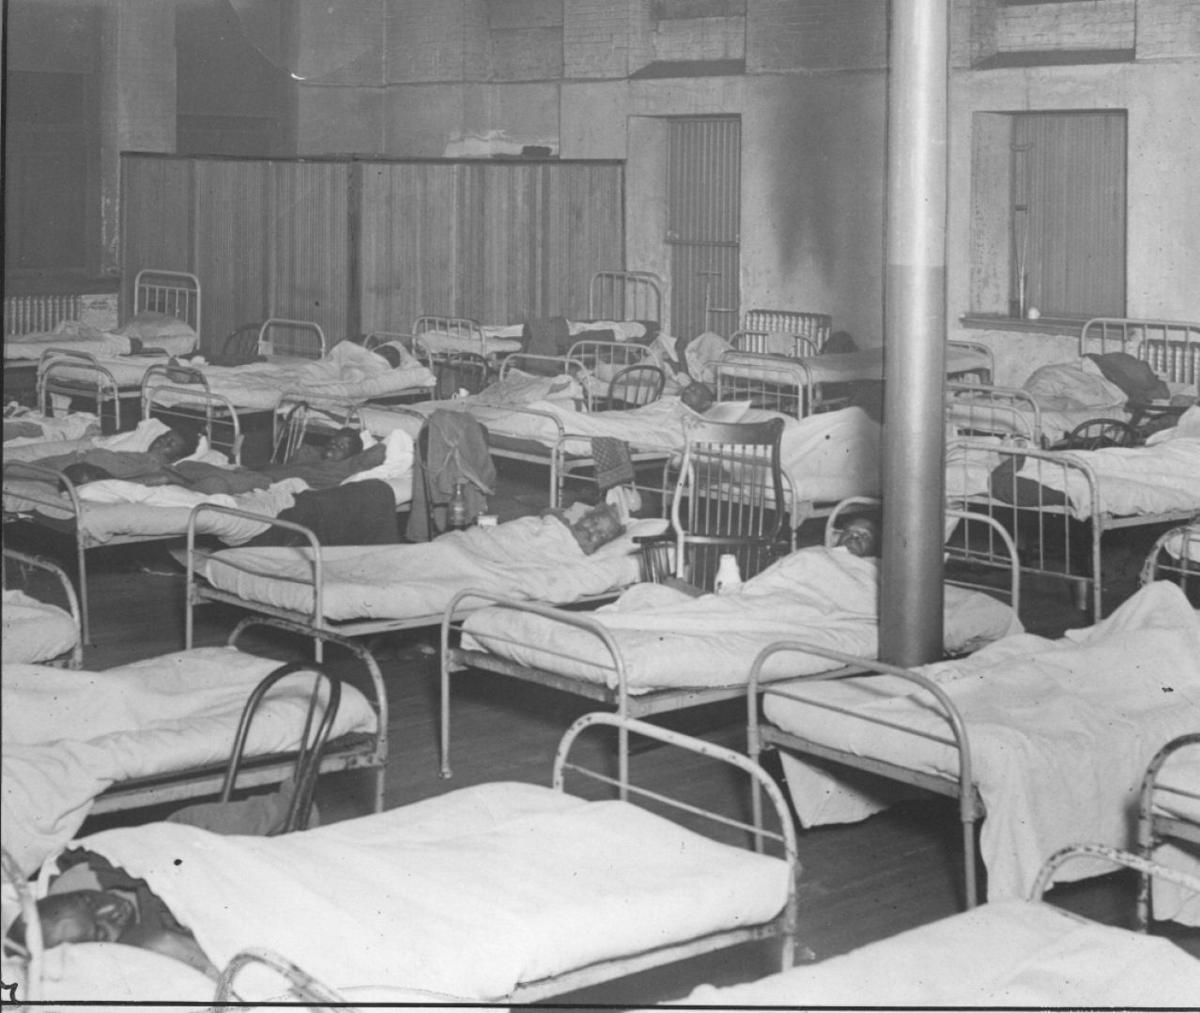 Inside City Hospital No. 2 in 1923